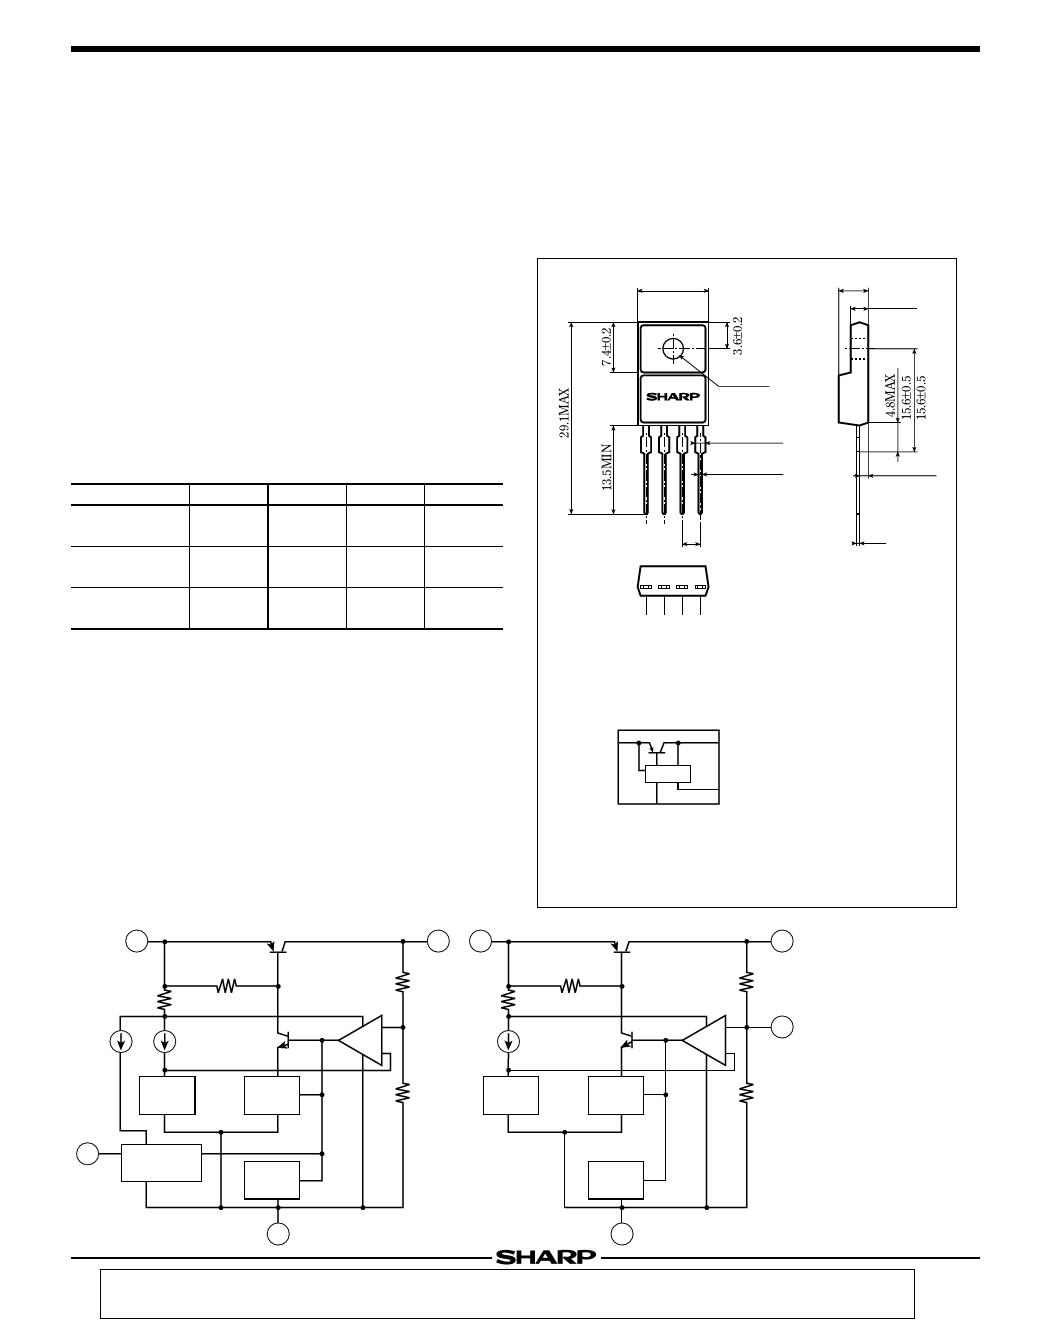 P005RF21 HTML VIEW PDF DOWNLOAD , P005RF21 Hoja de datos -Sharp